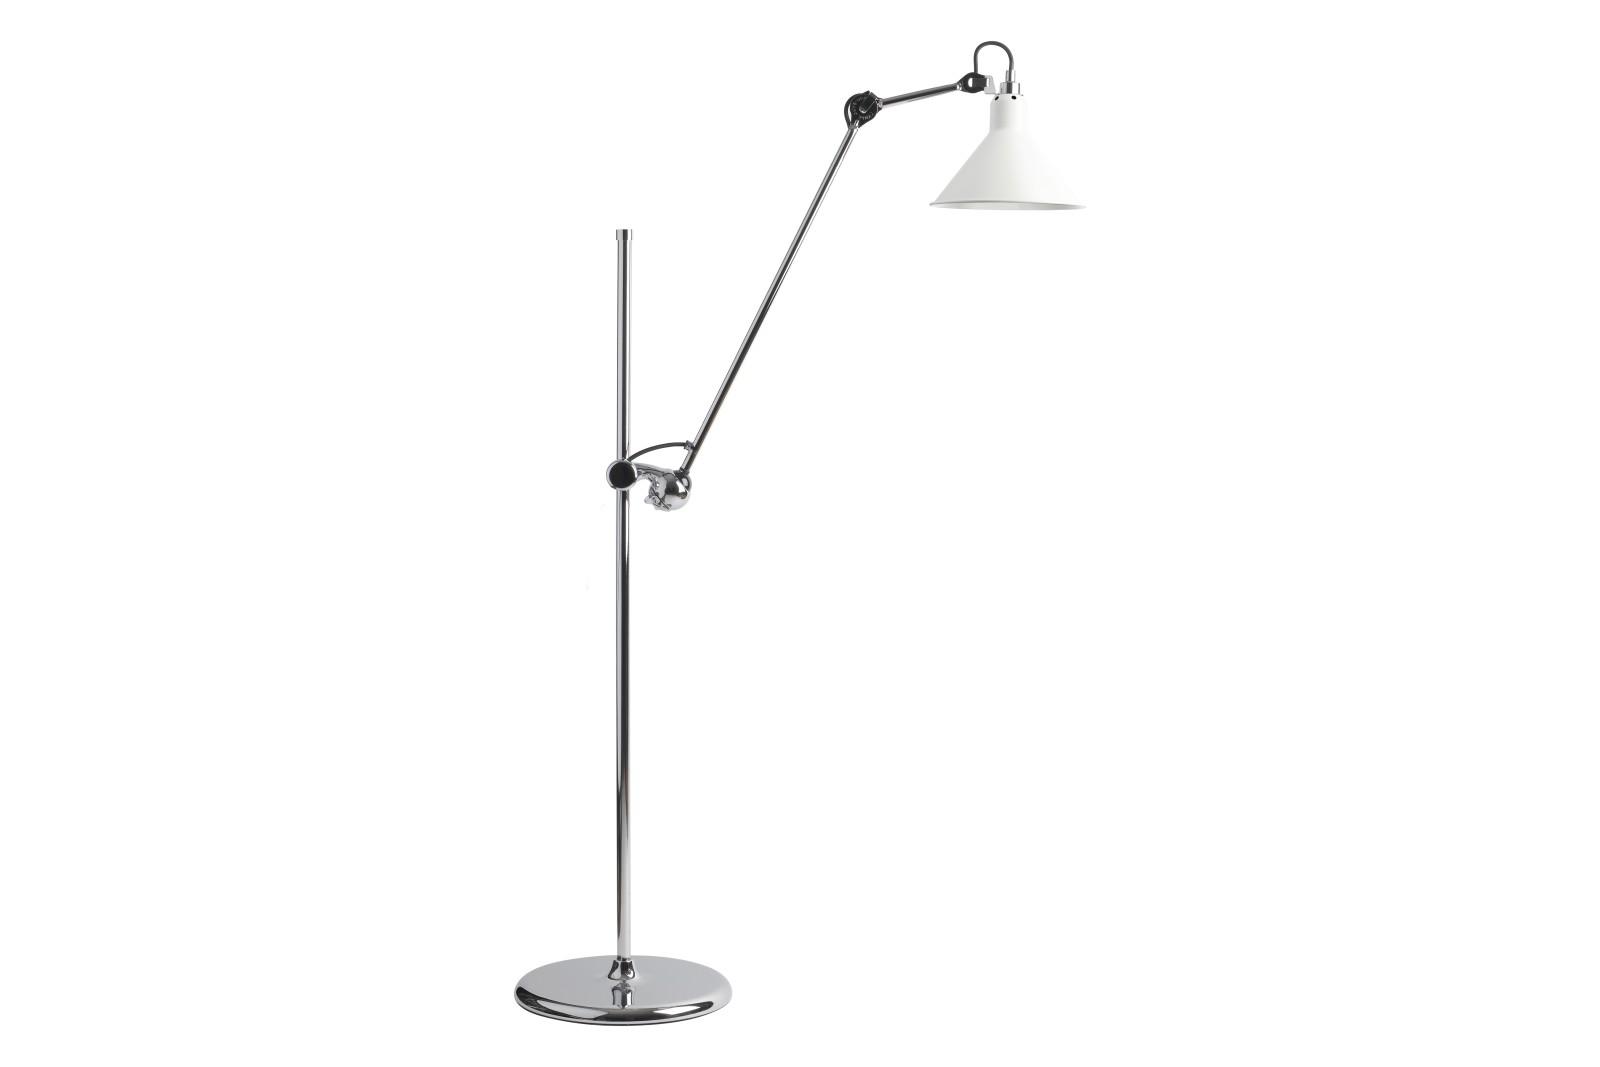 Lampe Gras N 215 Conic Shade Floor Lamp Chrome, White